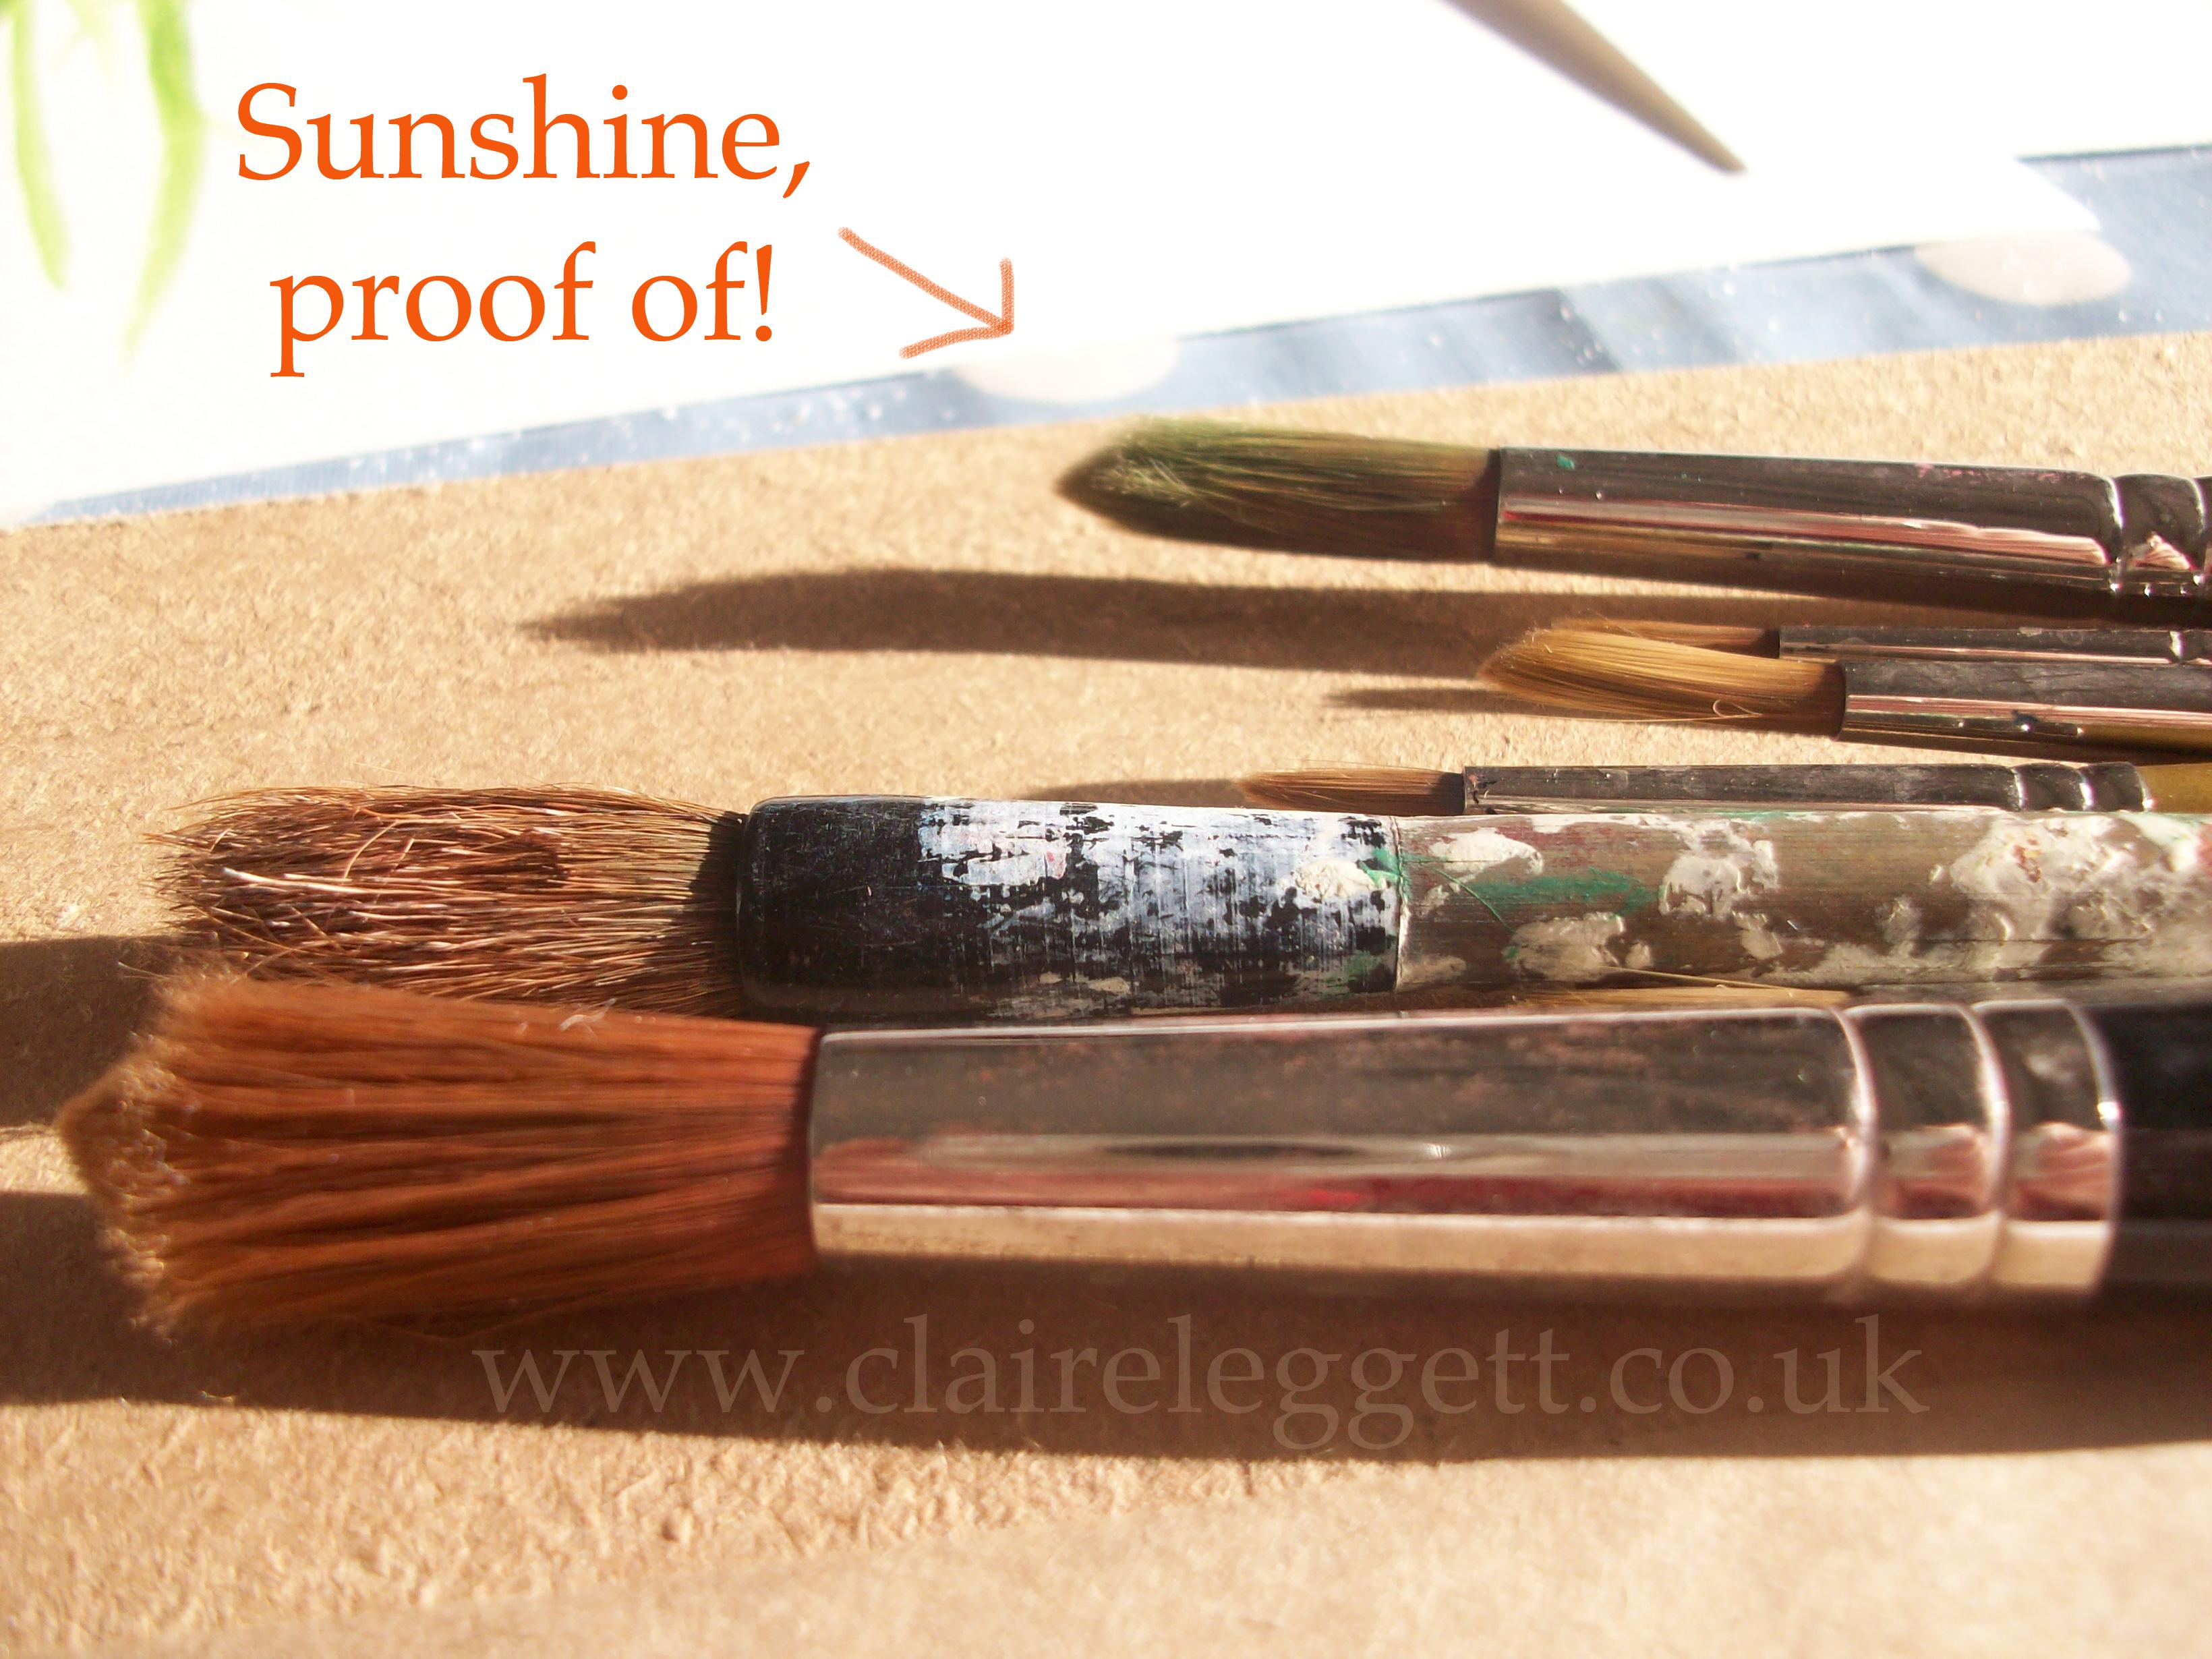 claire_leggett_sunny_paintbrushes